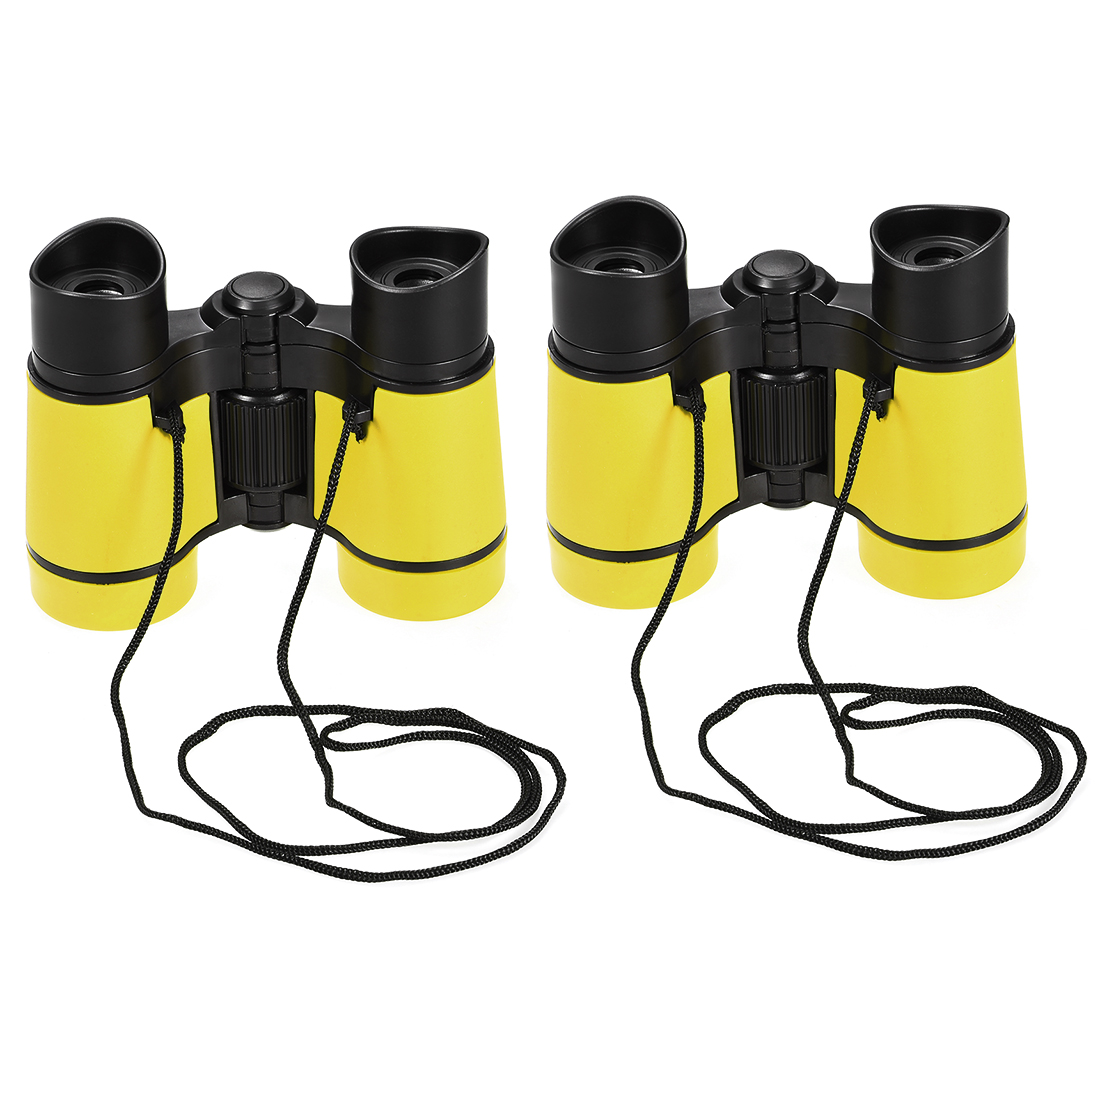 2pcs Toy Binoculars 4X30 Compact Foldable Binoculars Yellow with Neck Strap